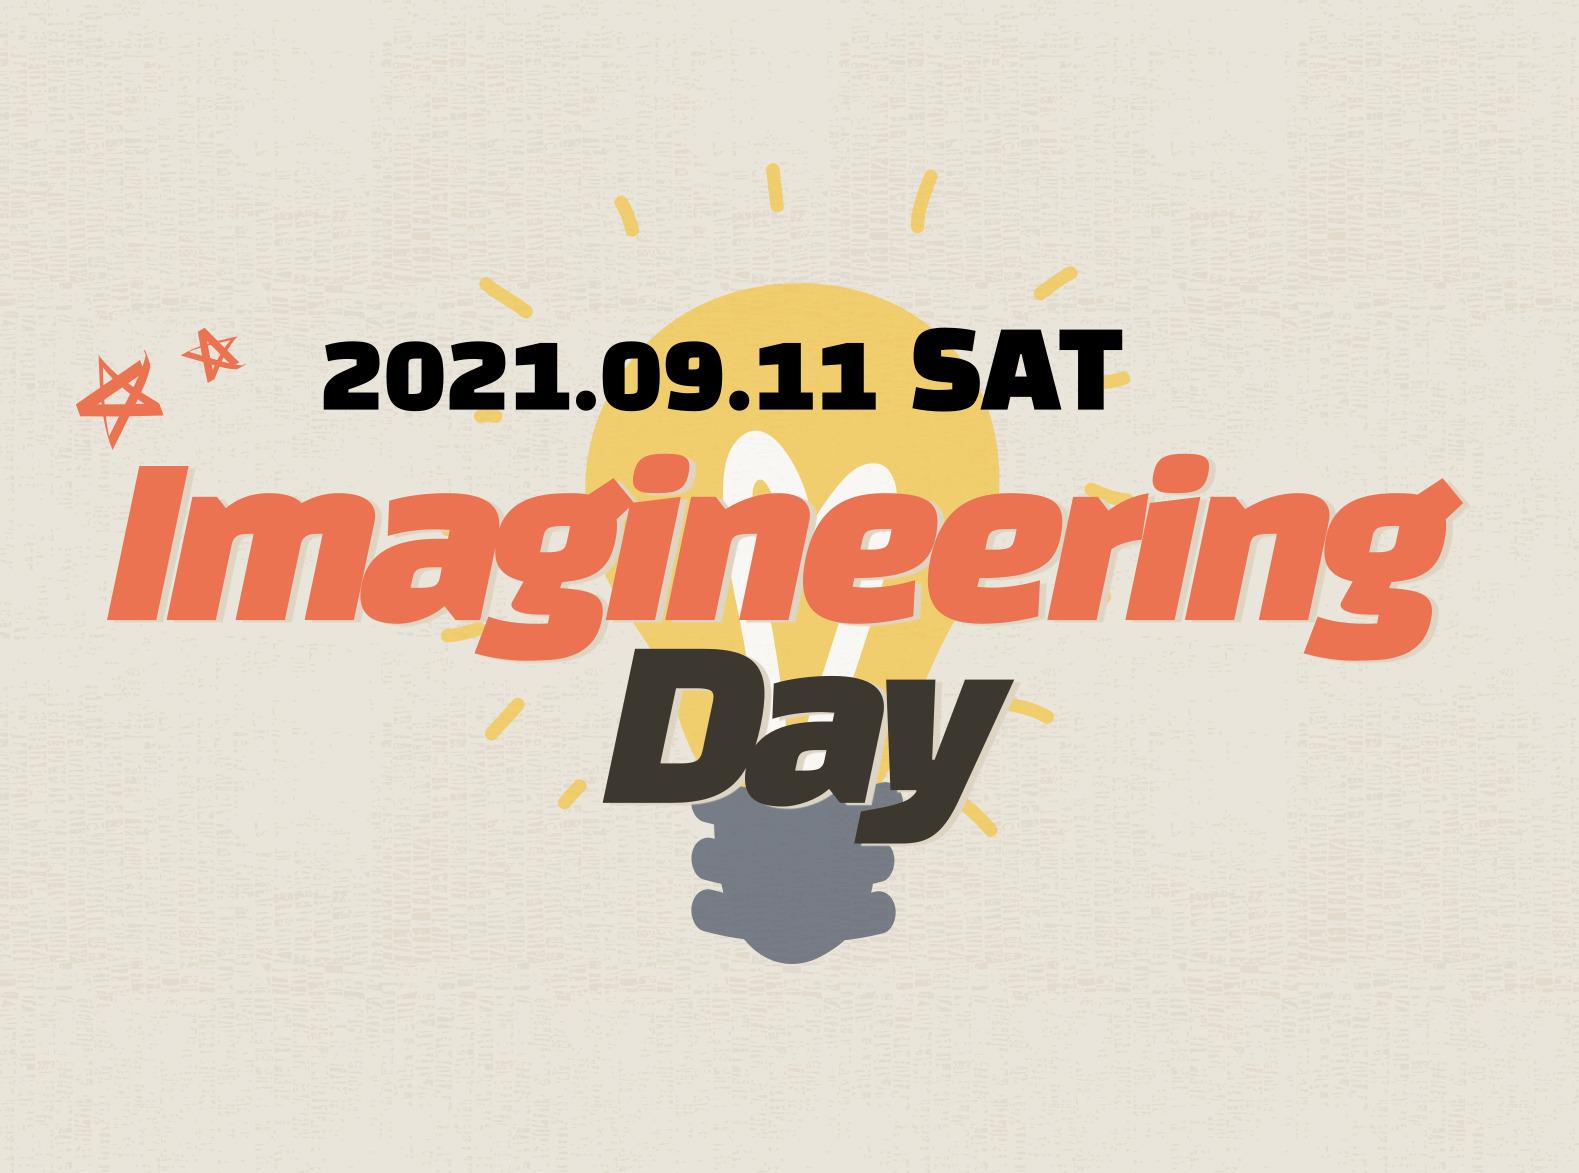 Imagineering Day 2차 진행